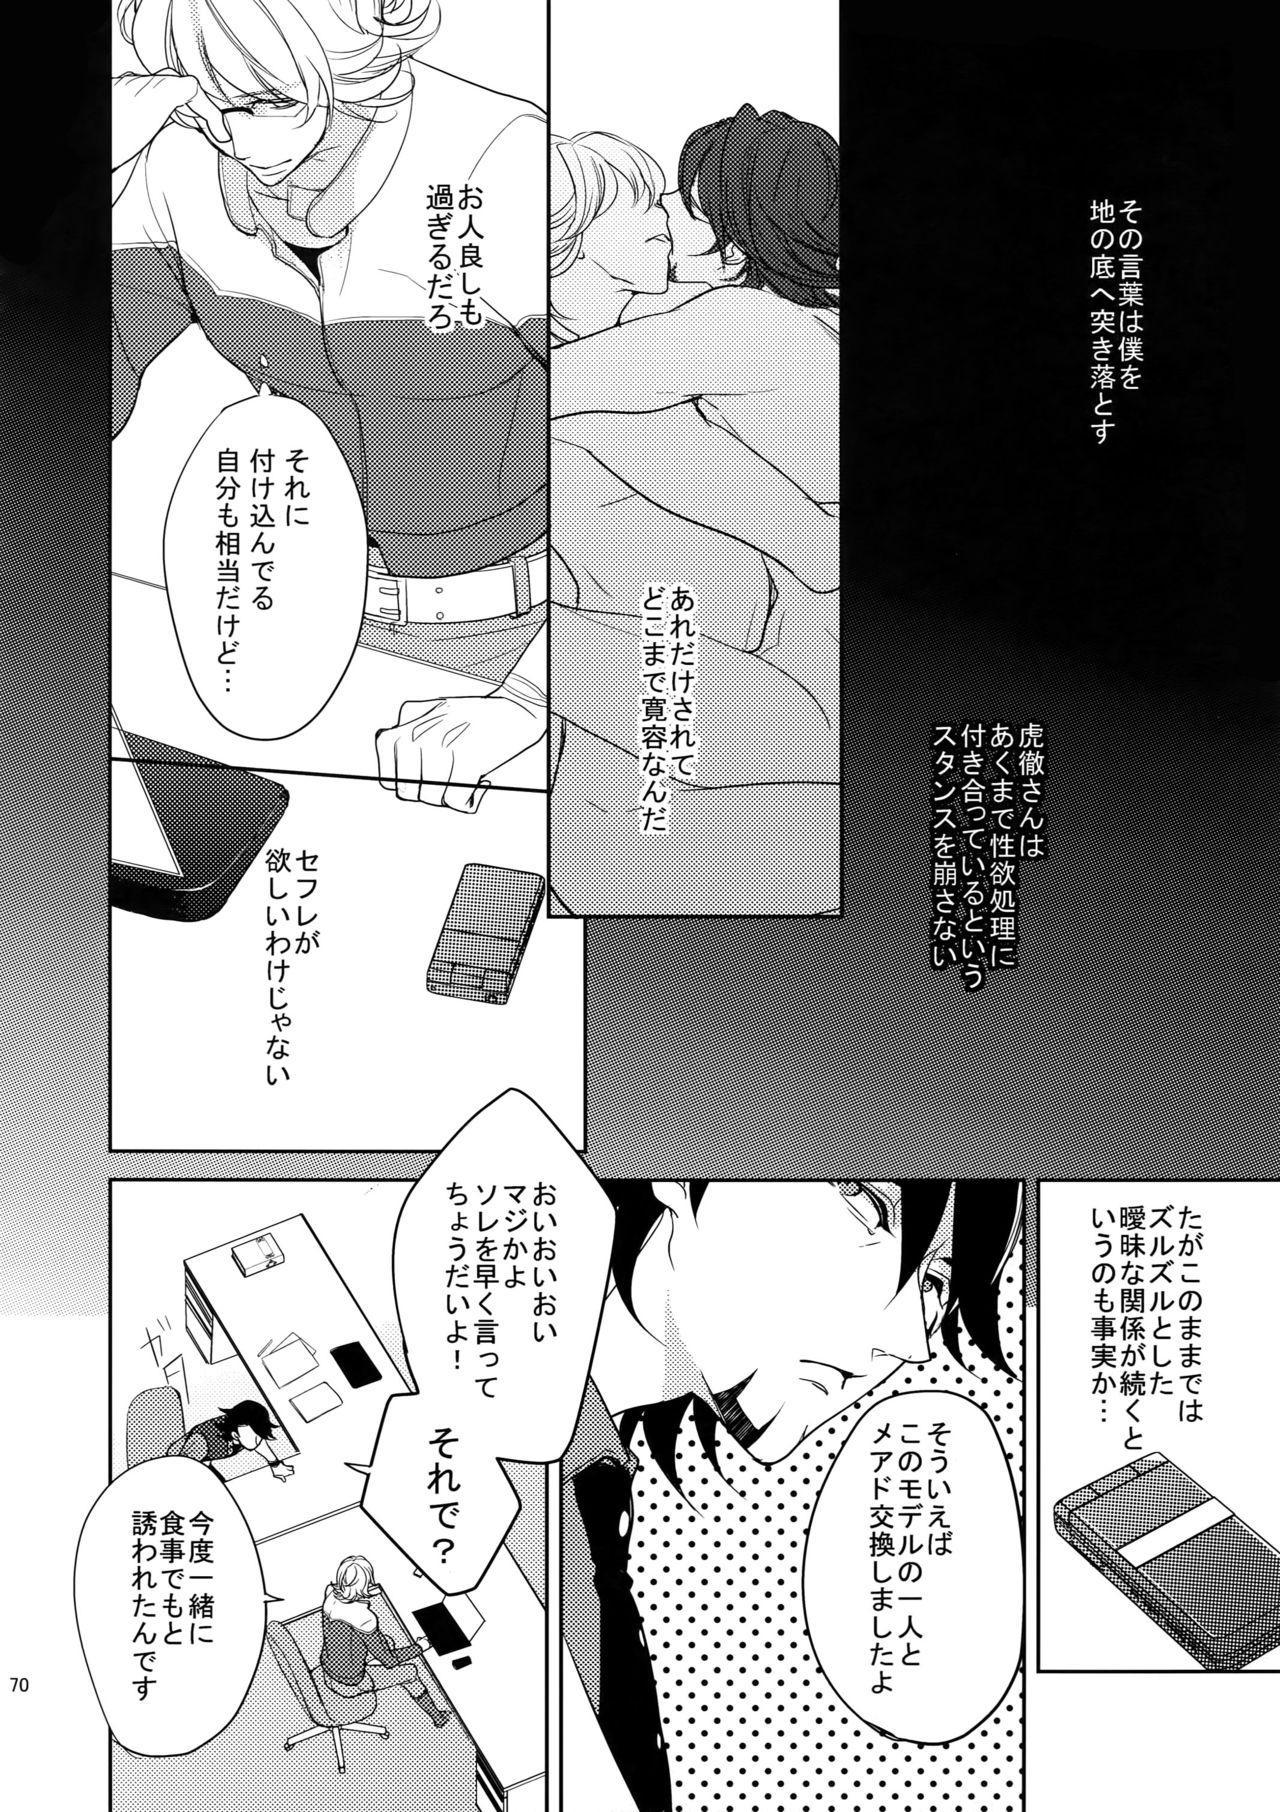 BOROZS Usagi Tora Sairoku 68